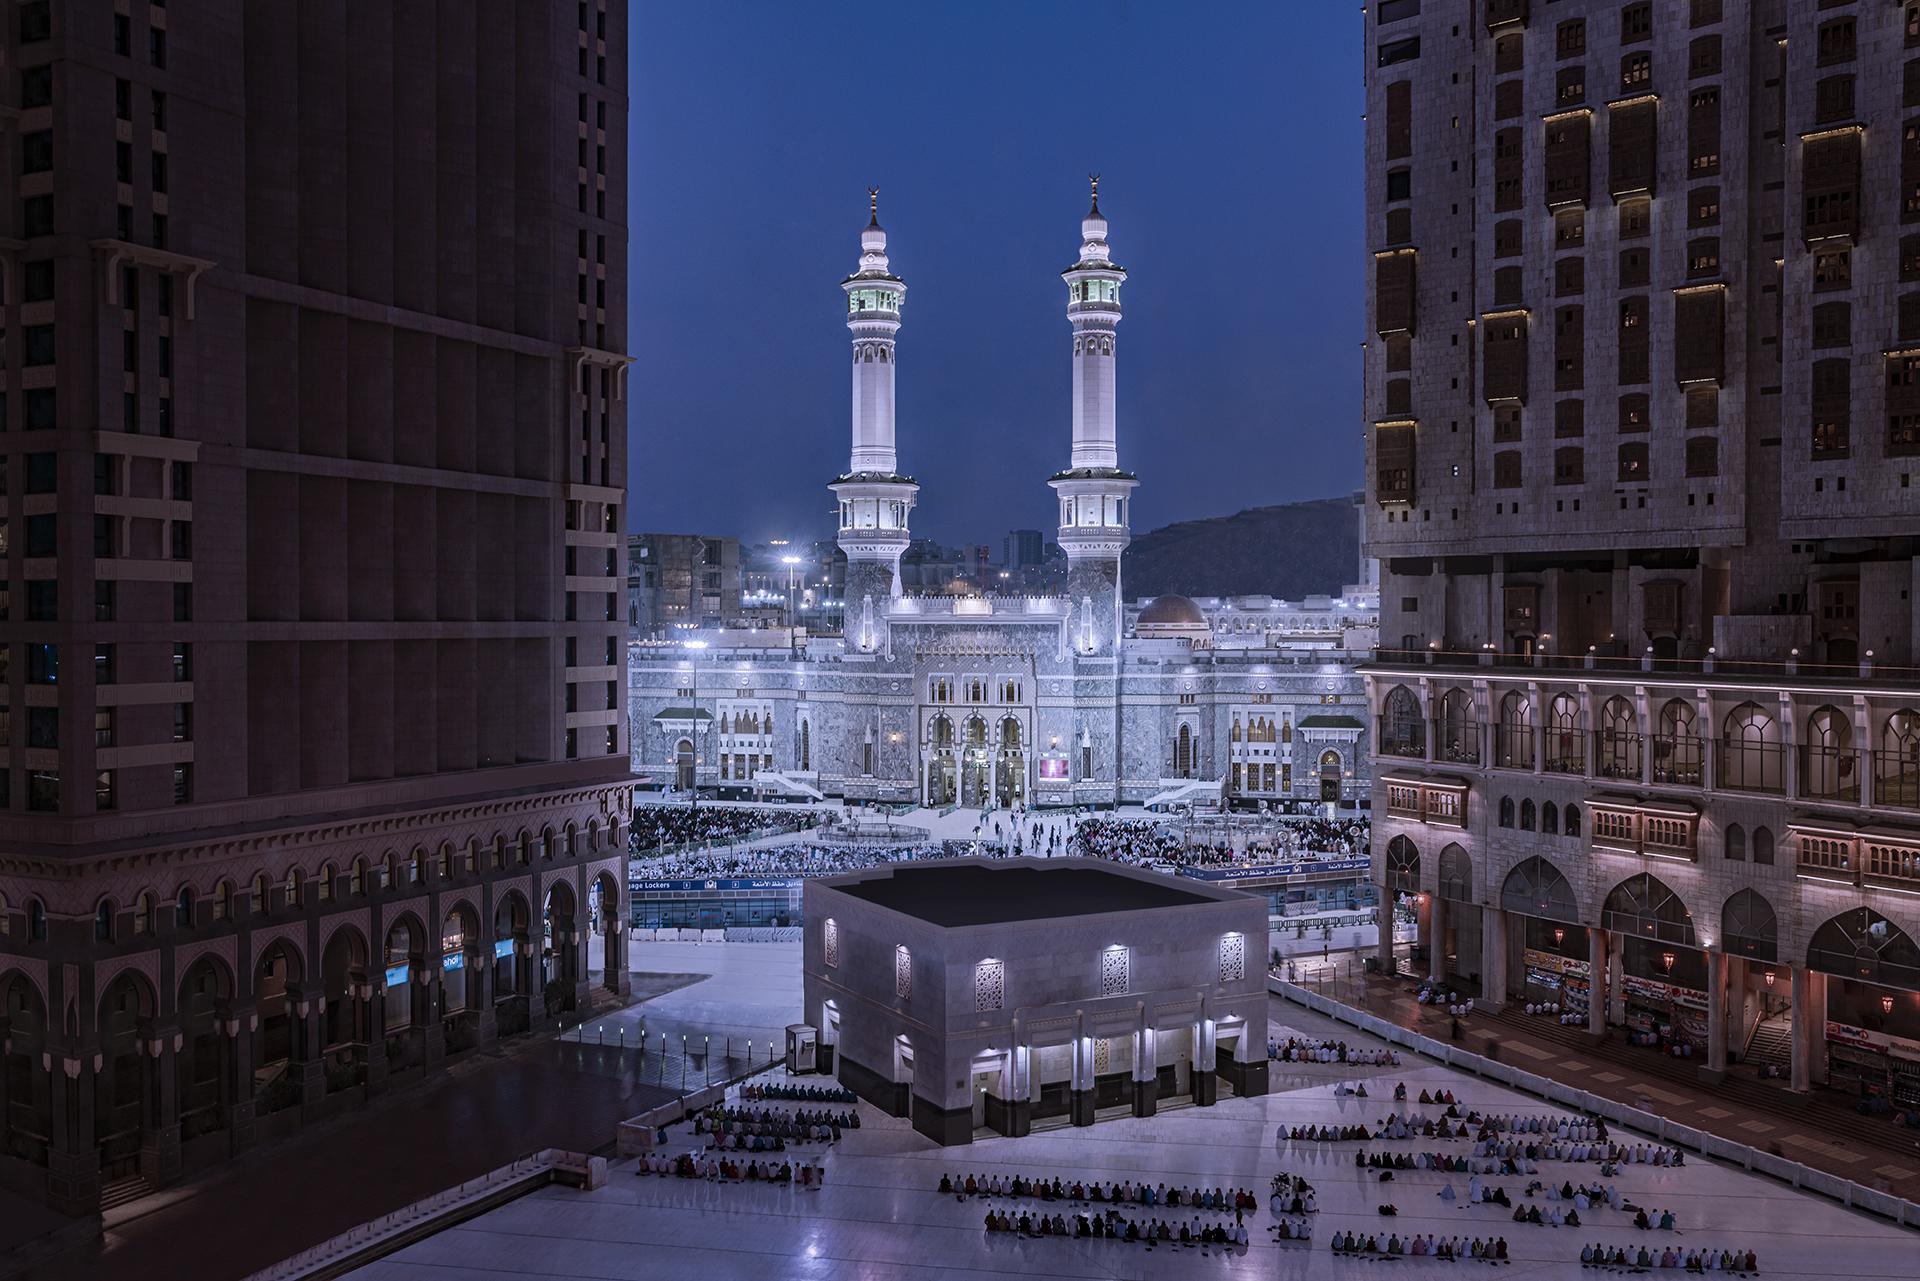 Makkah Conrad